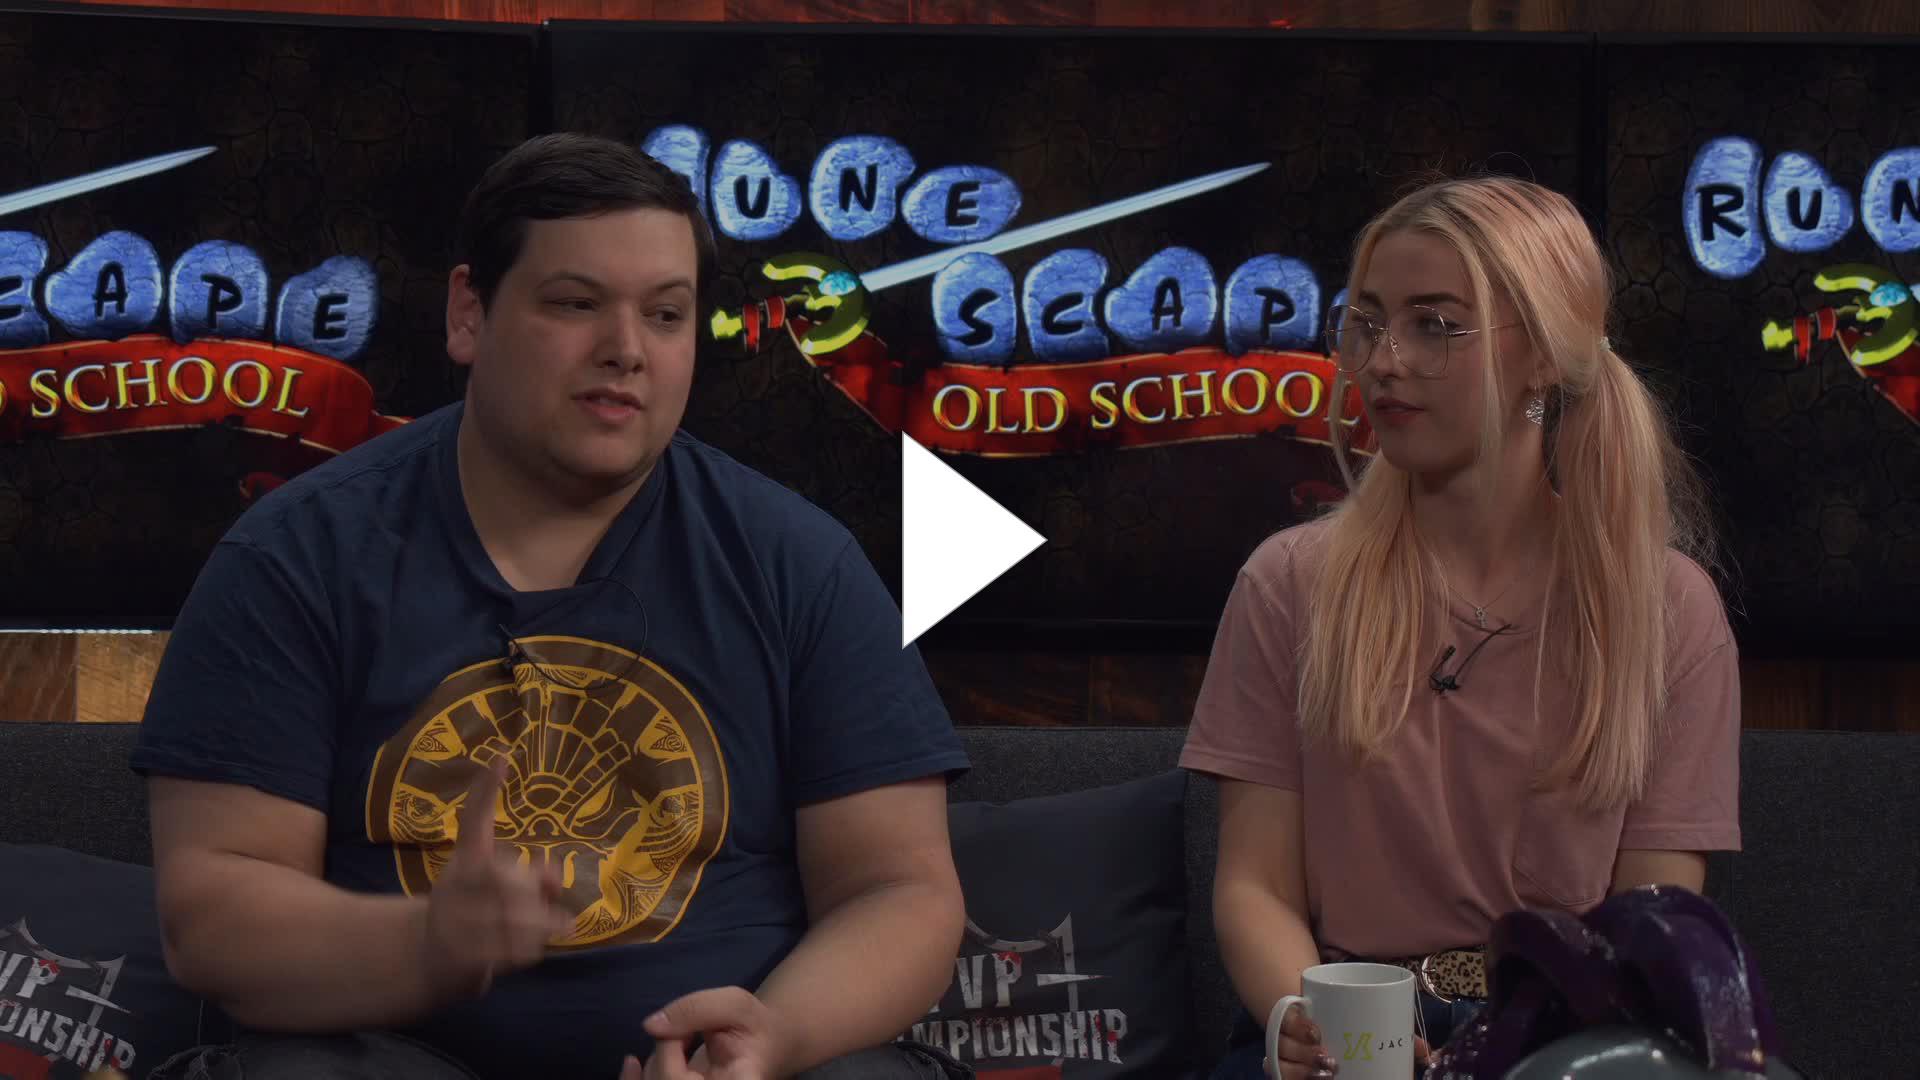 OldSchoolRS - Mod Gee - Twitch